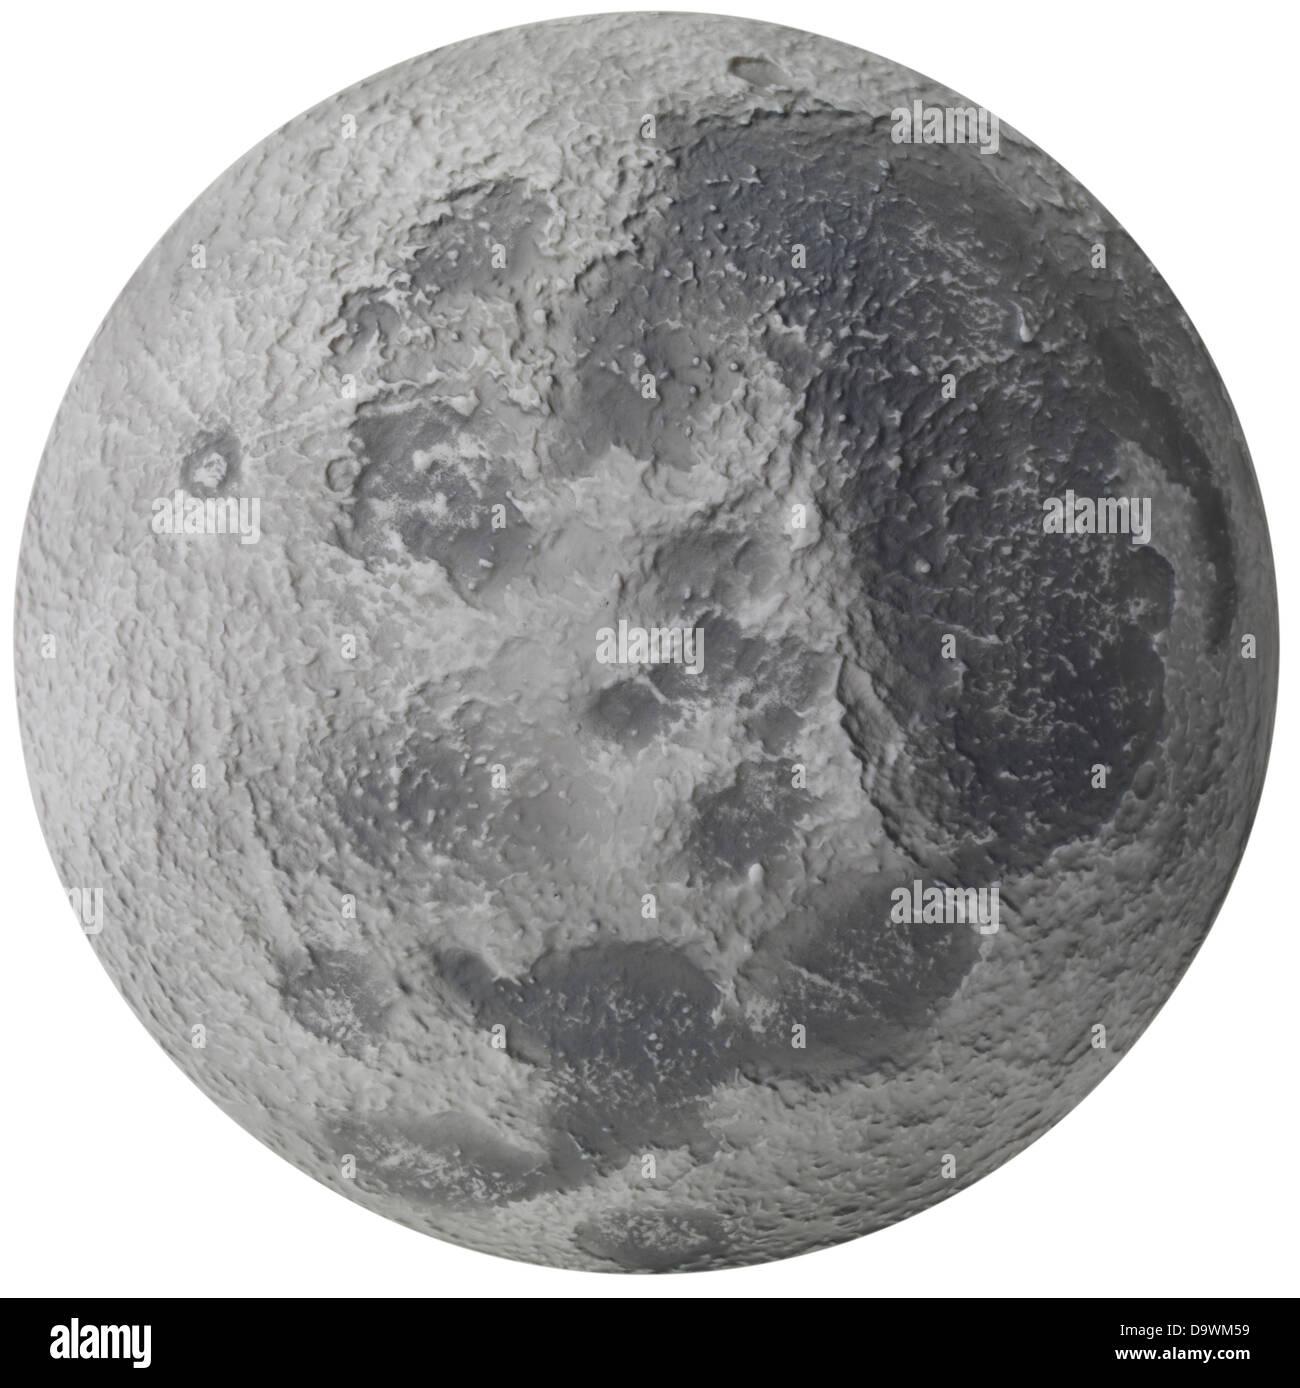 La superficie de la luna Imagen De Stock